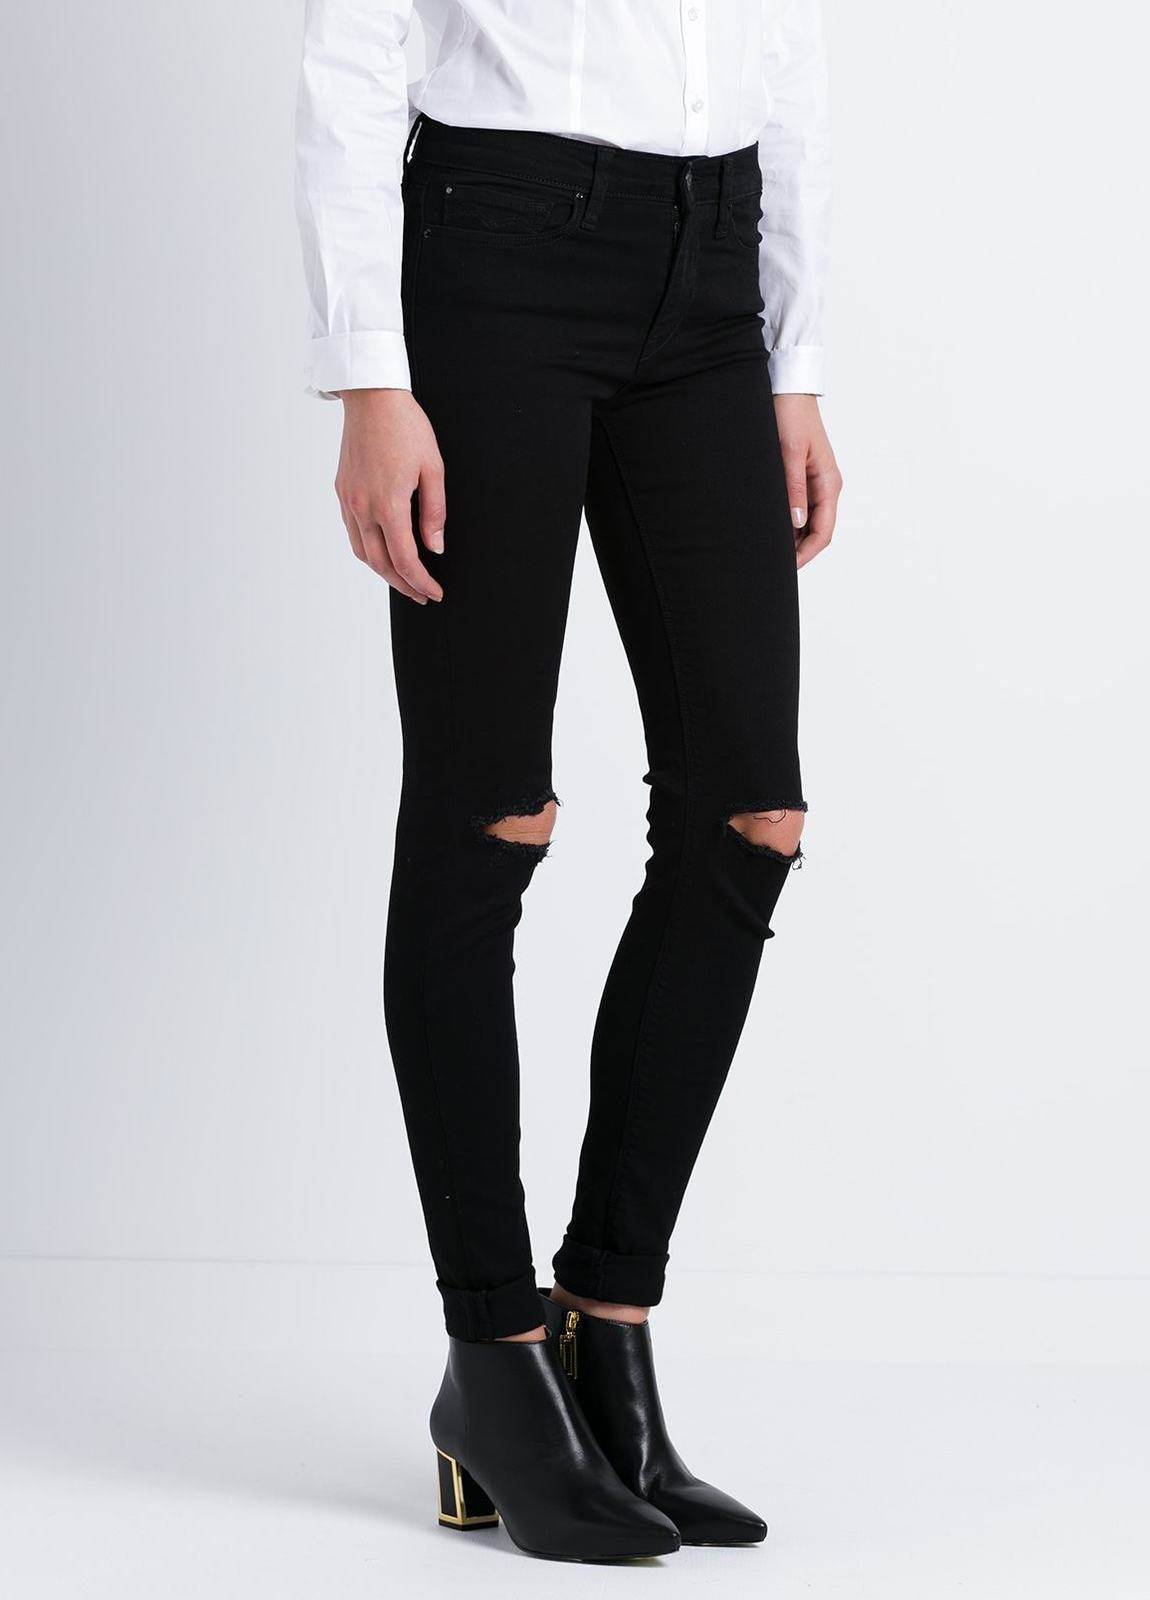 Tejano jegging modelo JOI con roturas en las rodillas color negro lavado denim. Algodón, Modal, Elastano. - Ítem1